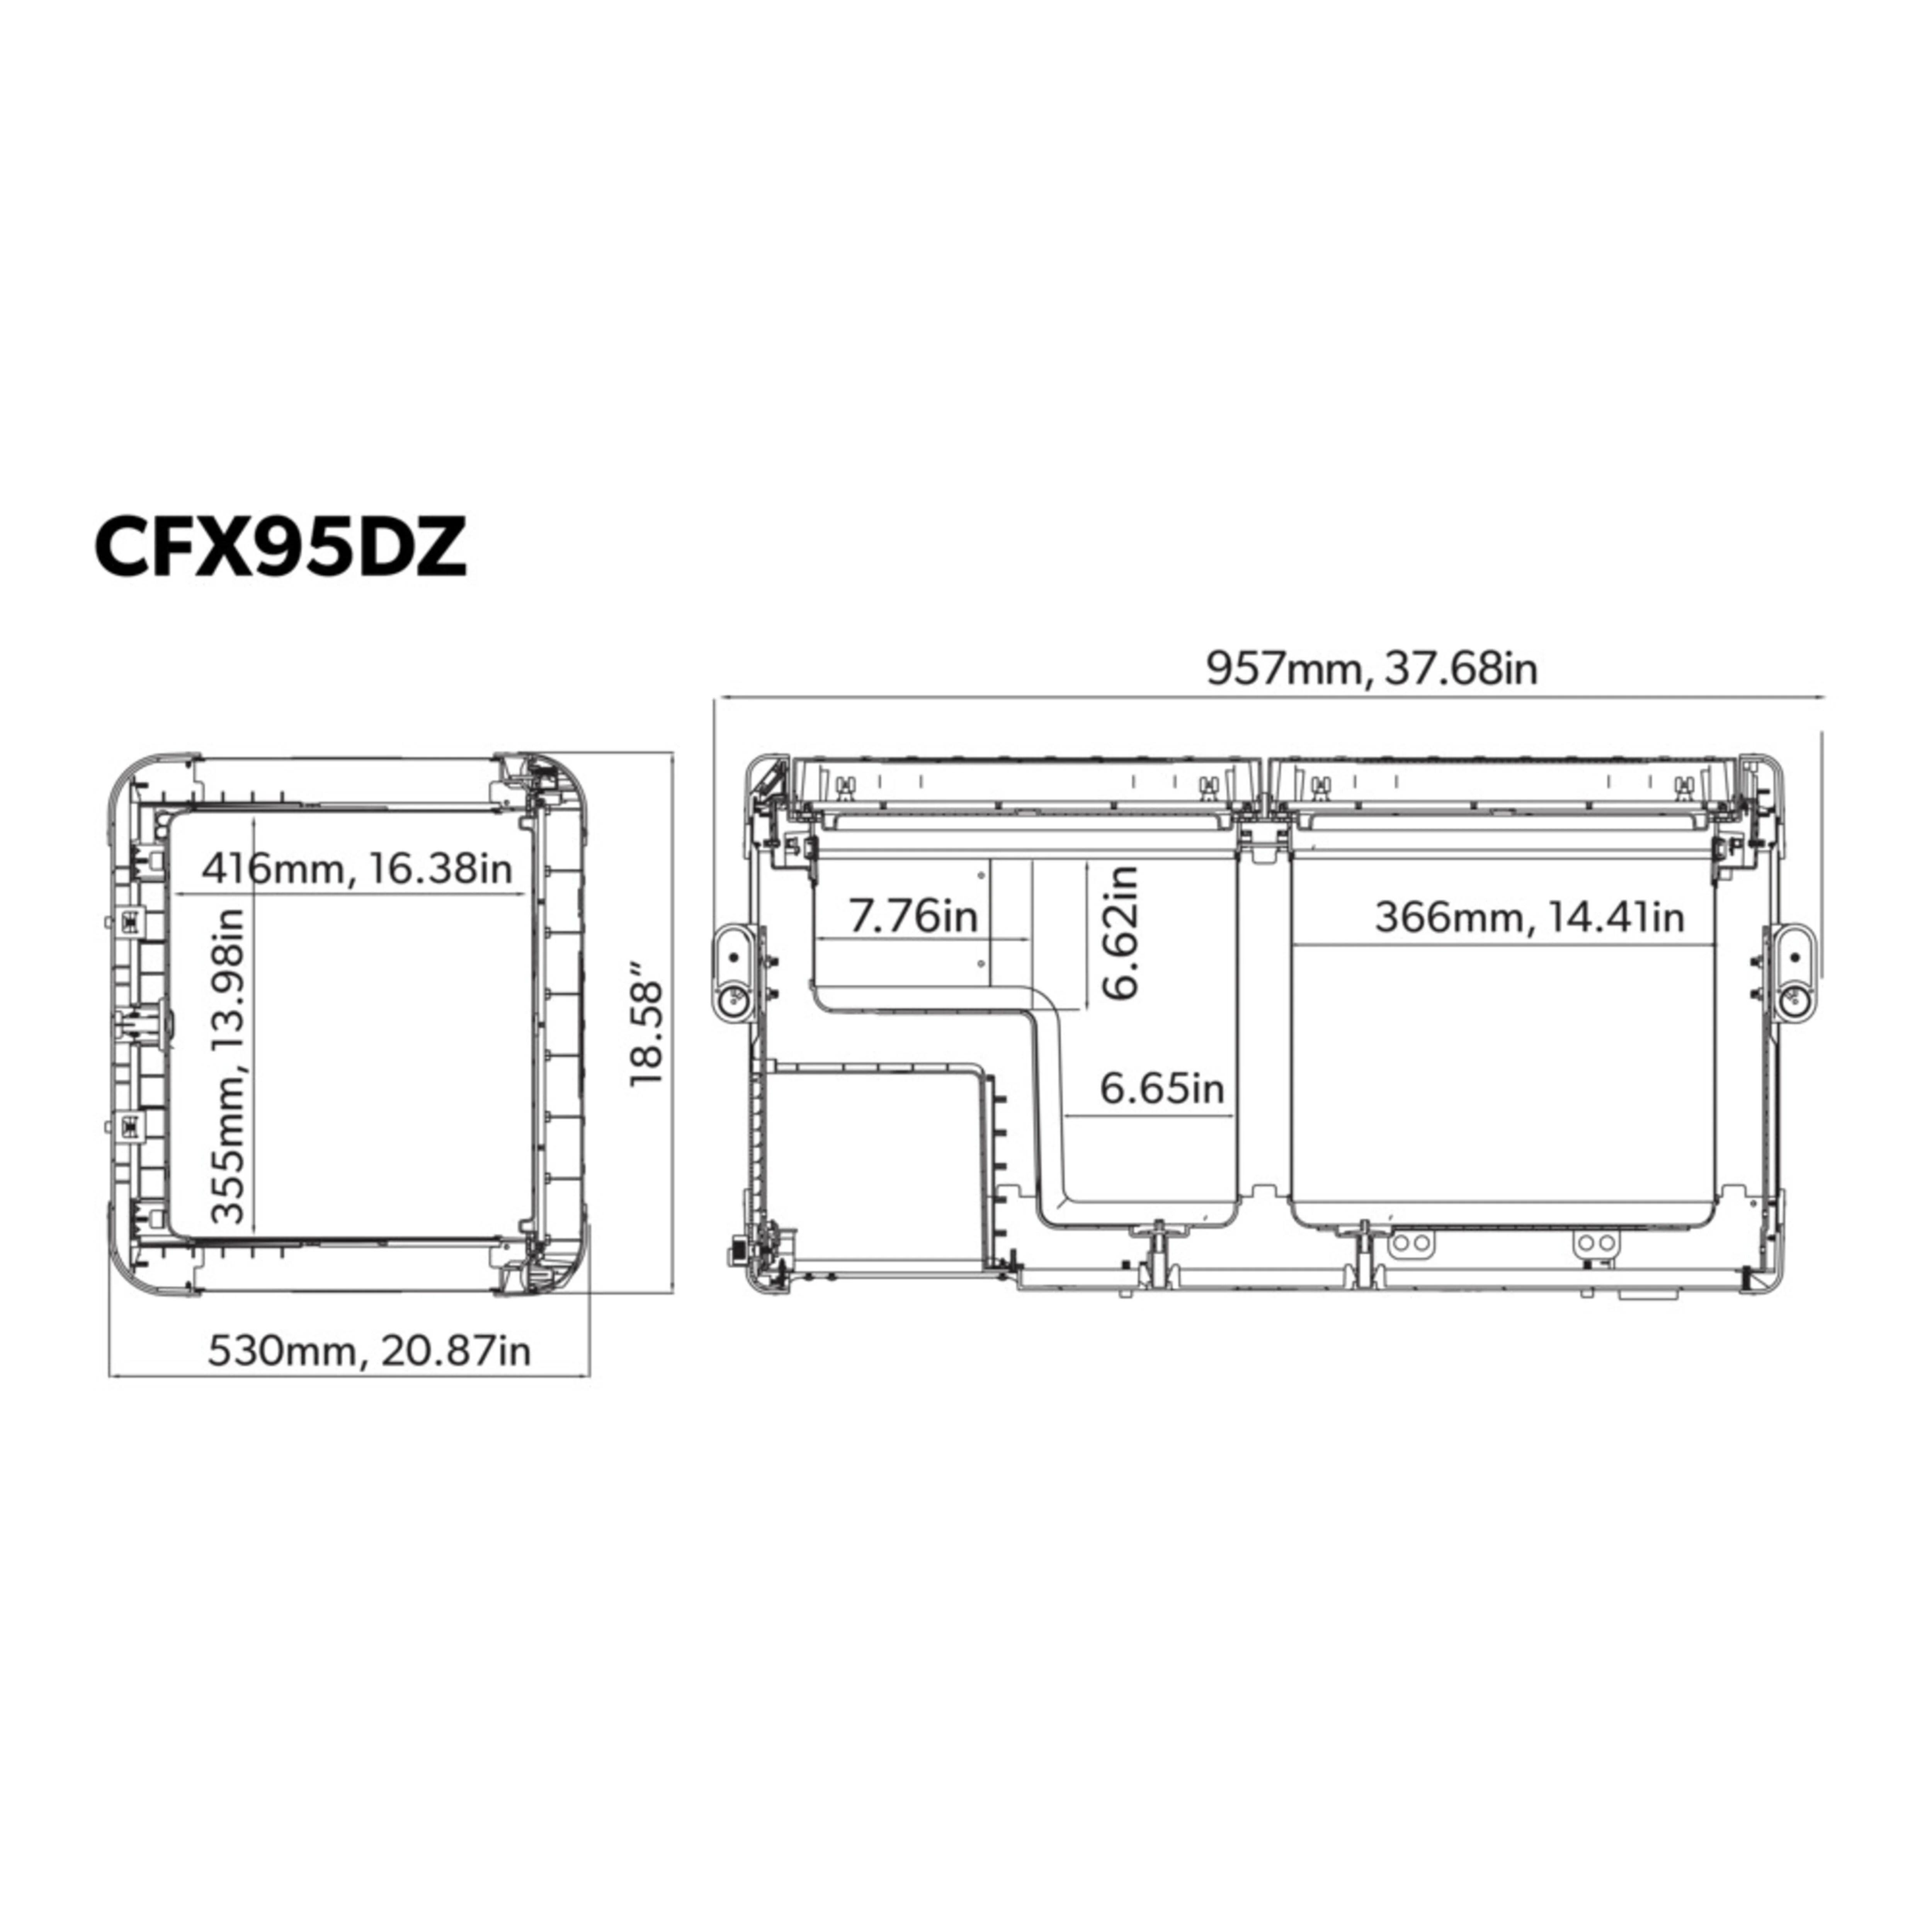 hight resolution of cfx 95dzw dimensions cfx 95dzw dimensions download manuals operating manual